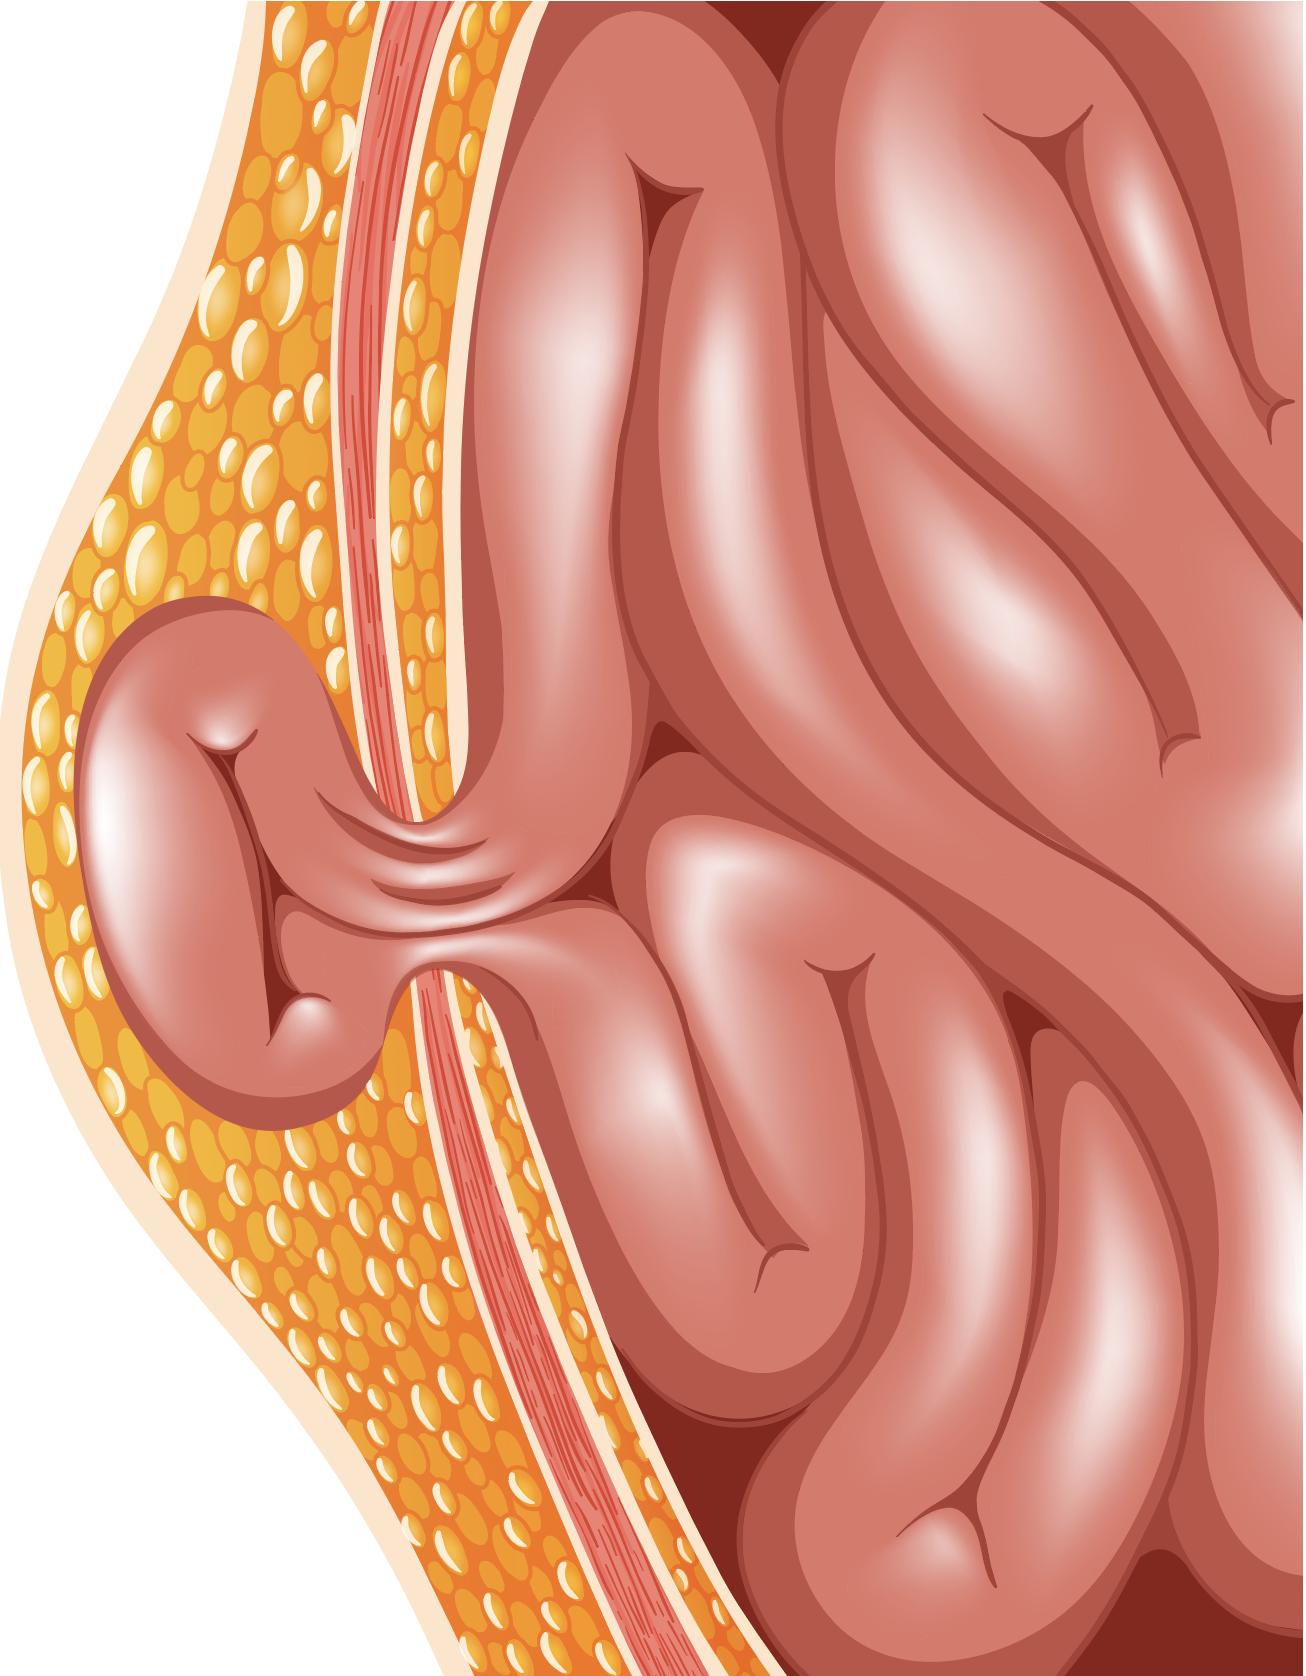 hernia-formed